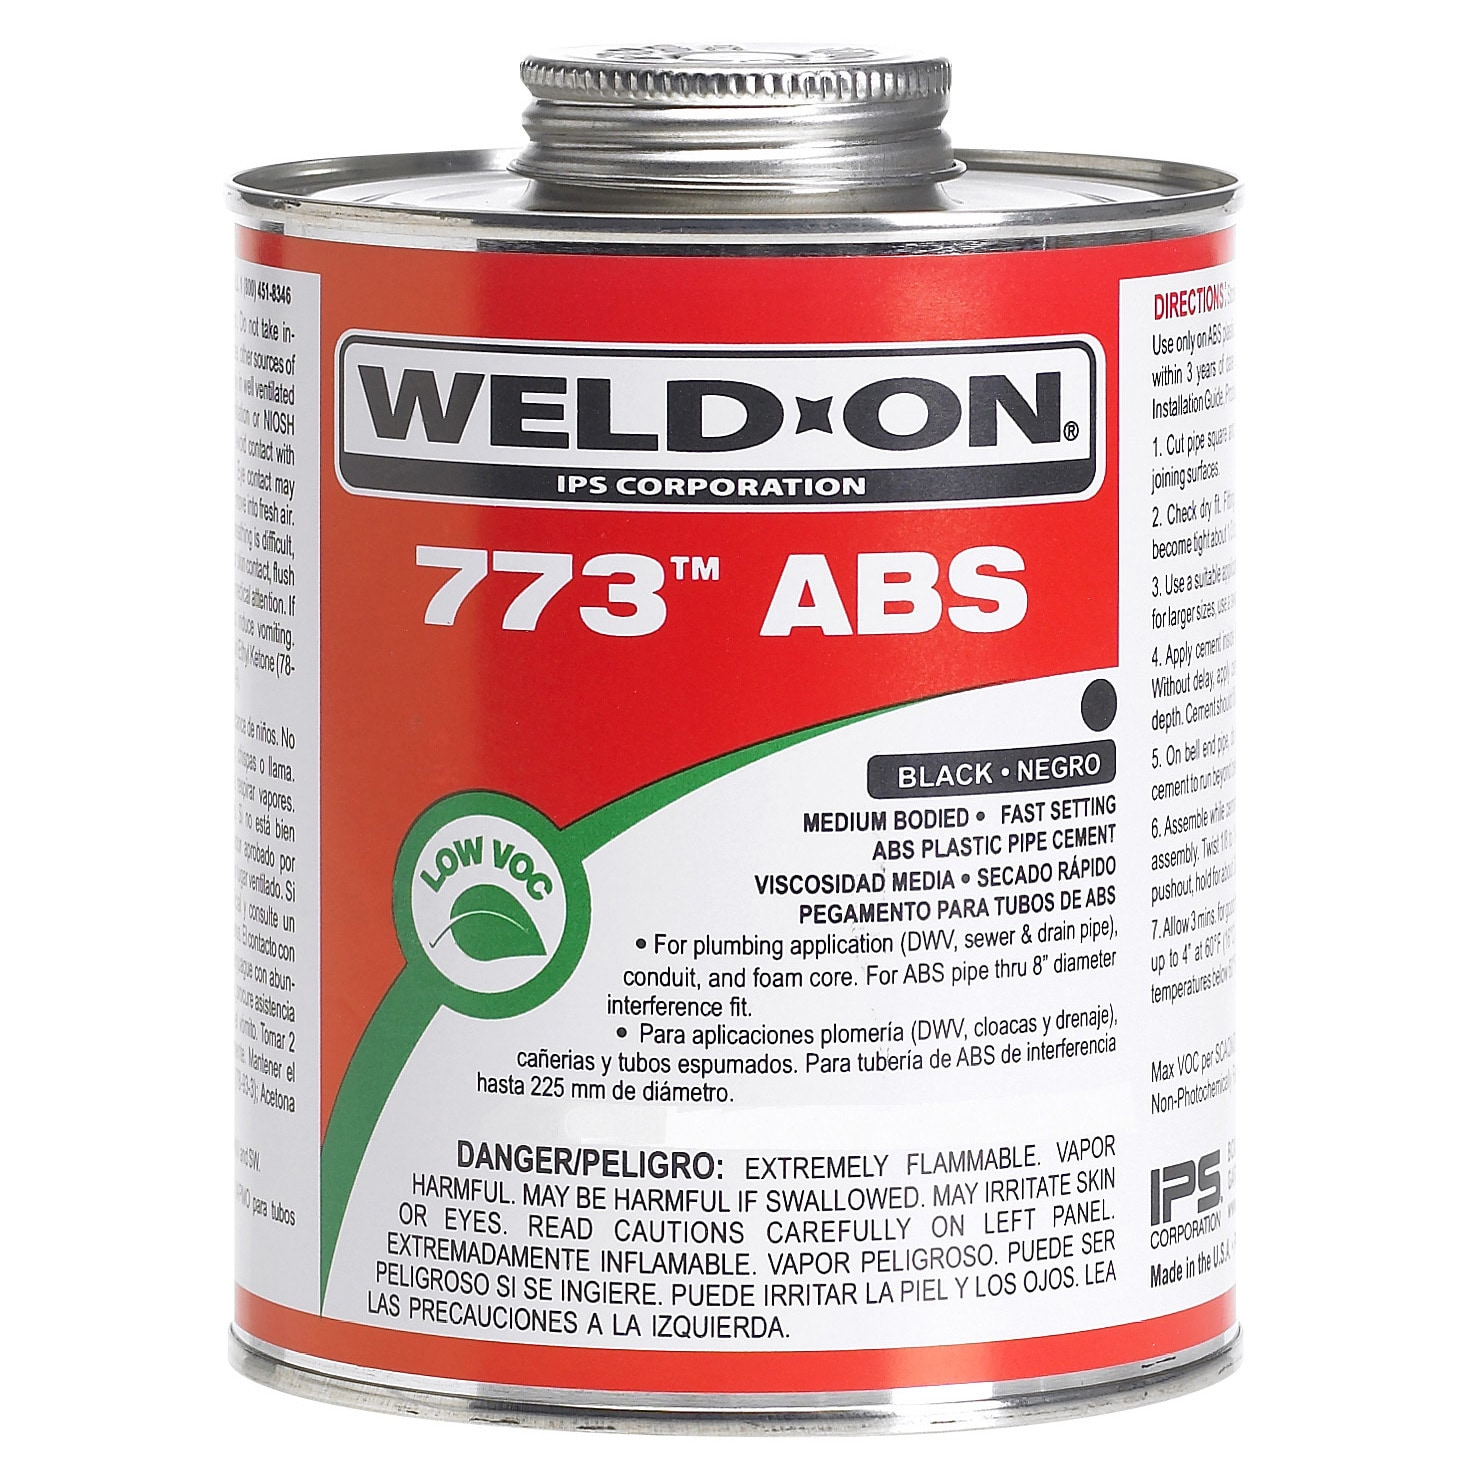 Ips Weldon 10243 1 Quart Black 773 ABS Cement (Abs Black ...